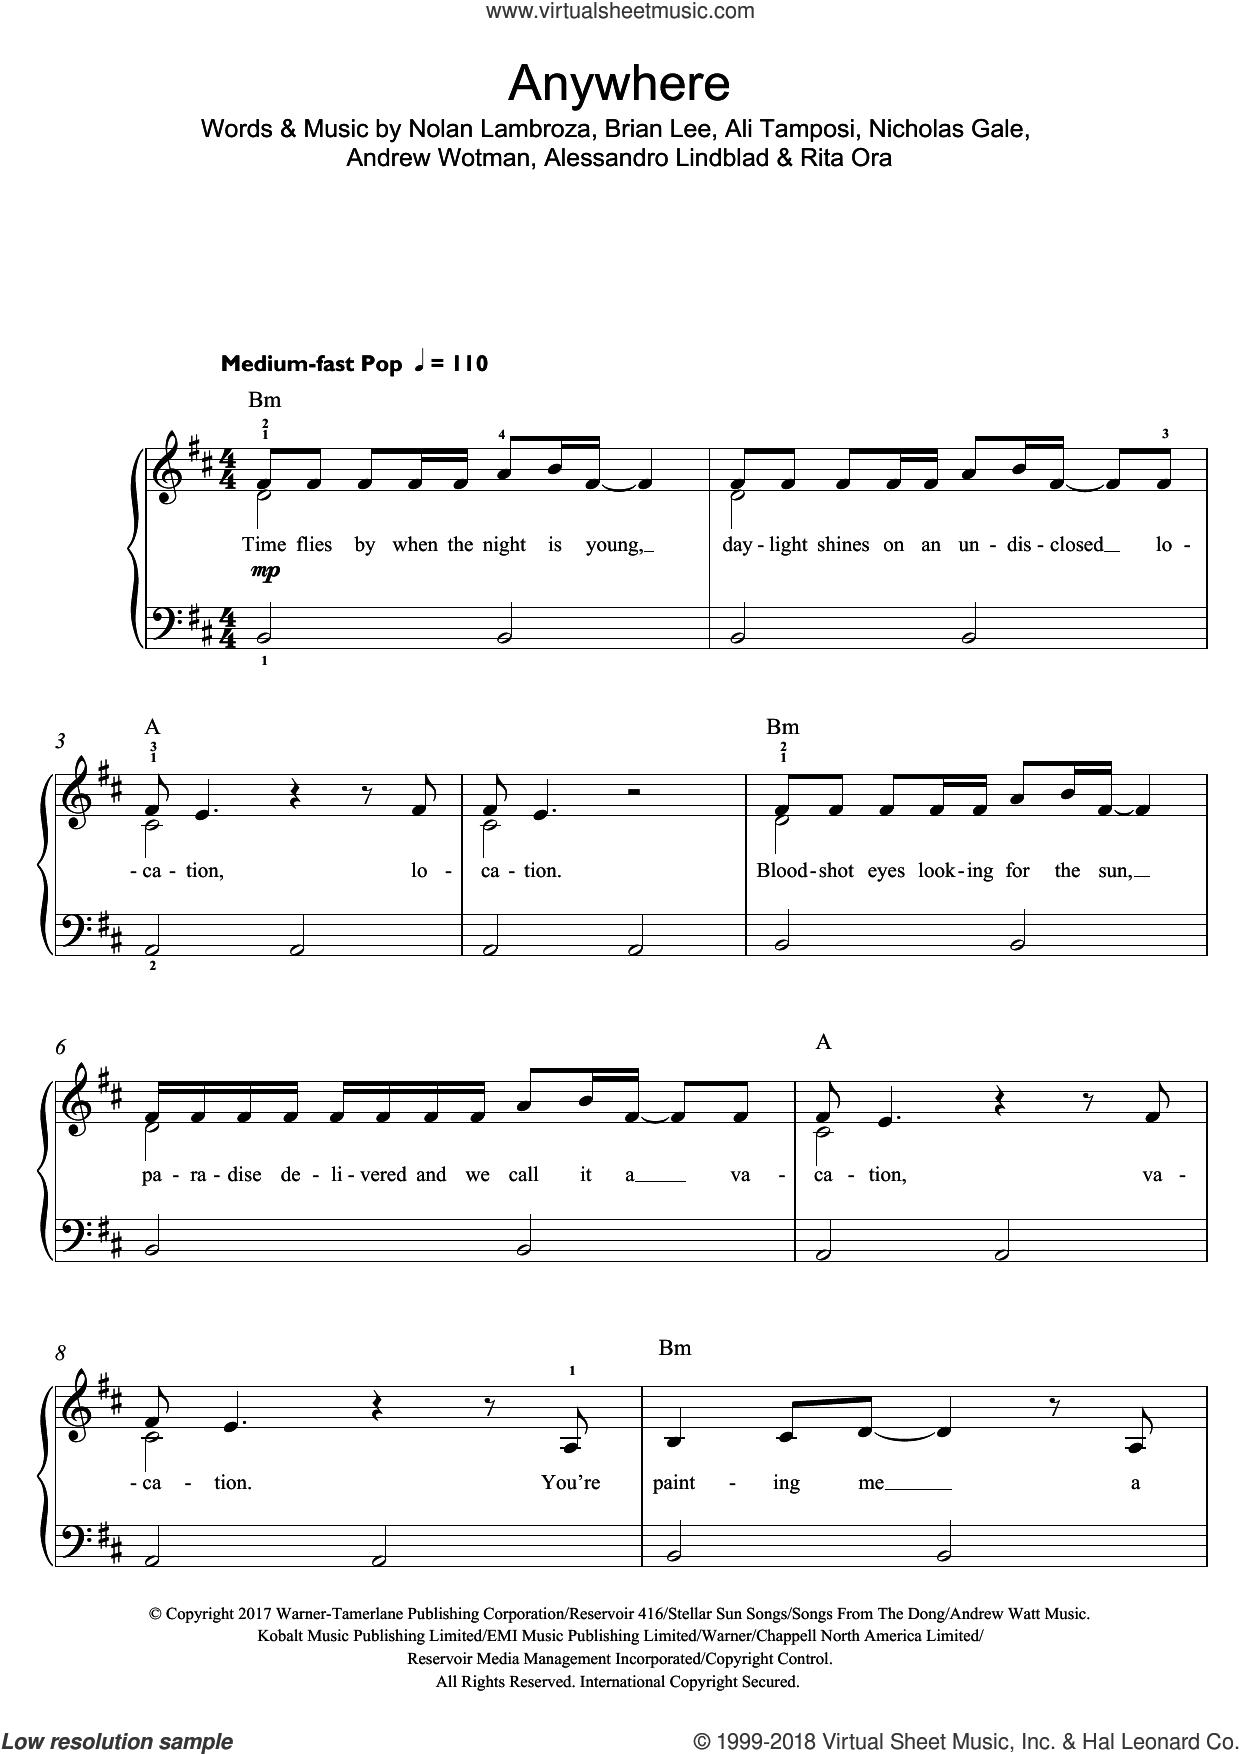 Anywhere sheet music for piano solo (beginners) by Rita Ora, Alessandro Lindblad, Ali Tamposi, Andrew Wotman, Brian Lee, Nicholas Gale and Nolan Lambroza, beginner piano (beginners)